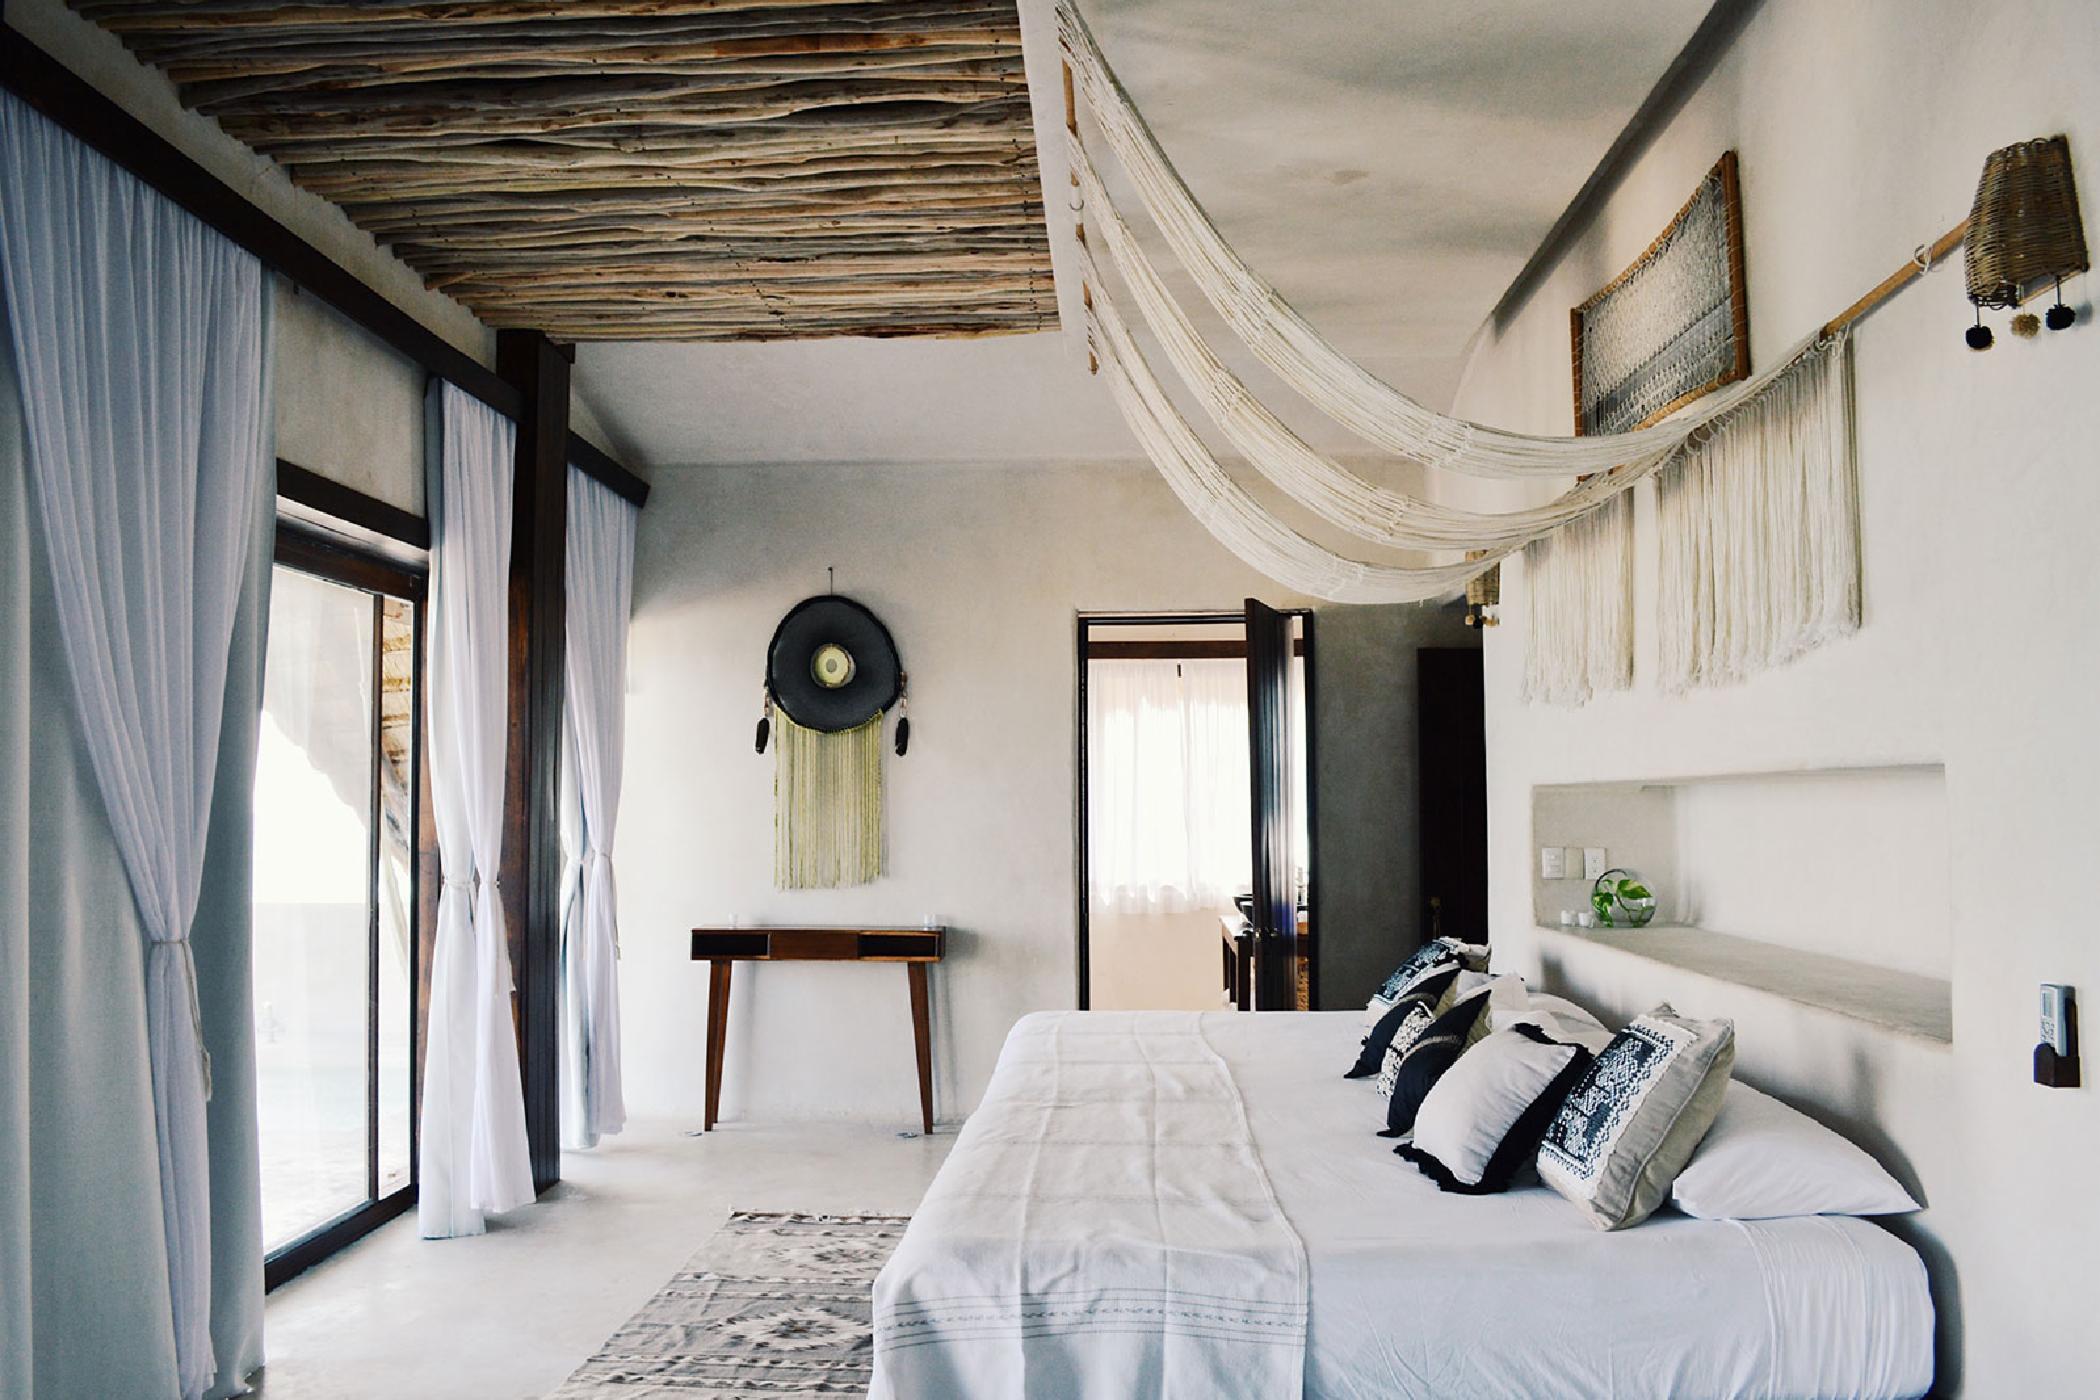 Maya_Luxe_Riviera_Maya_Luxury_Villas_Experiences_Hotel_Zone_Tulum_Beach_5_Bedrooms_Casa_Palapa_13.jpg